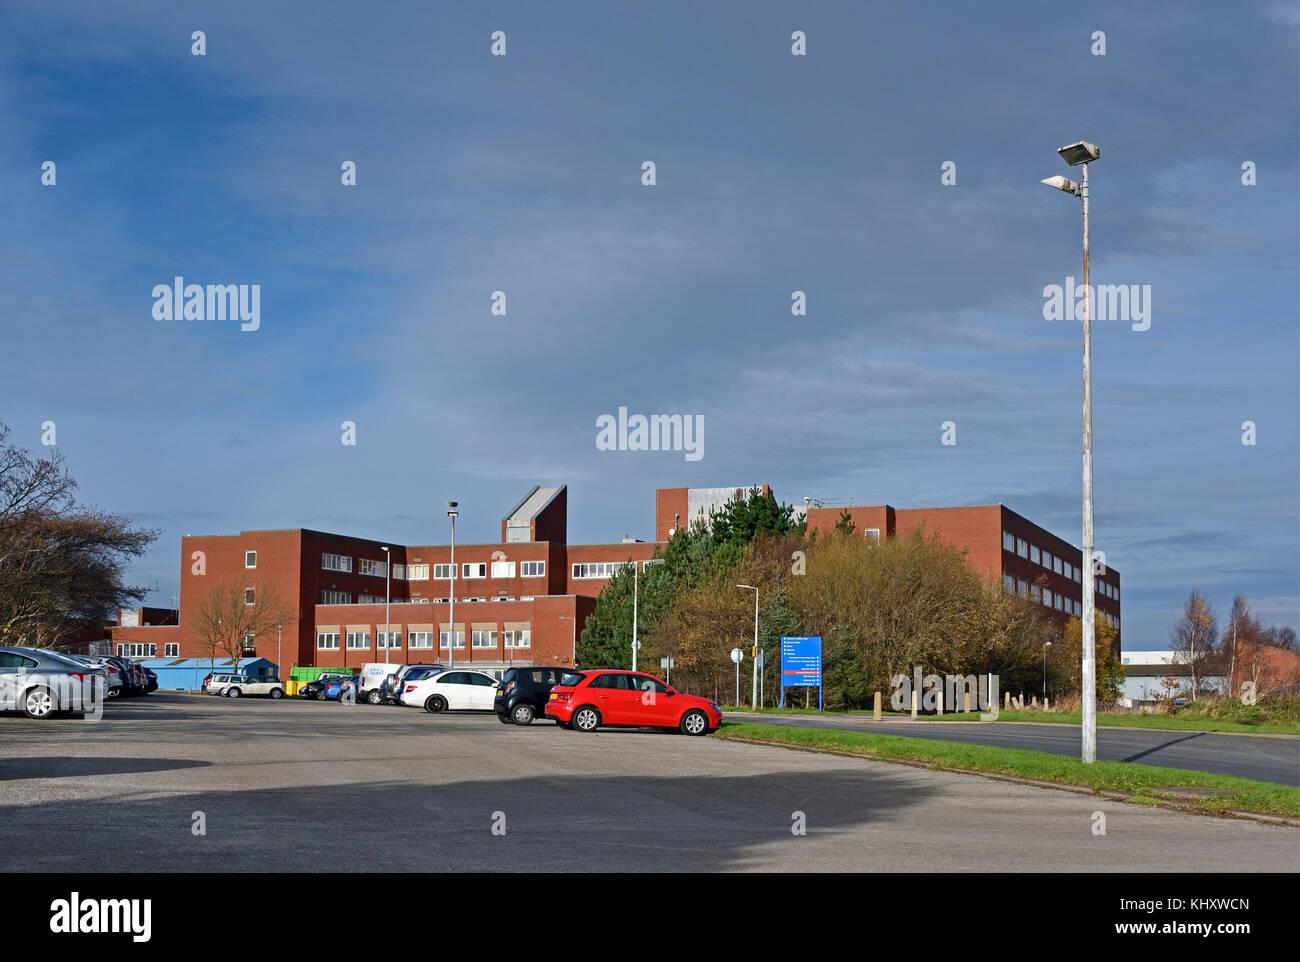 Furness General Hospital, Barrow-in-Furness, Cumbria, England, United Kingdom, Europe. - Stock Image